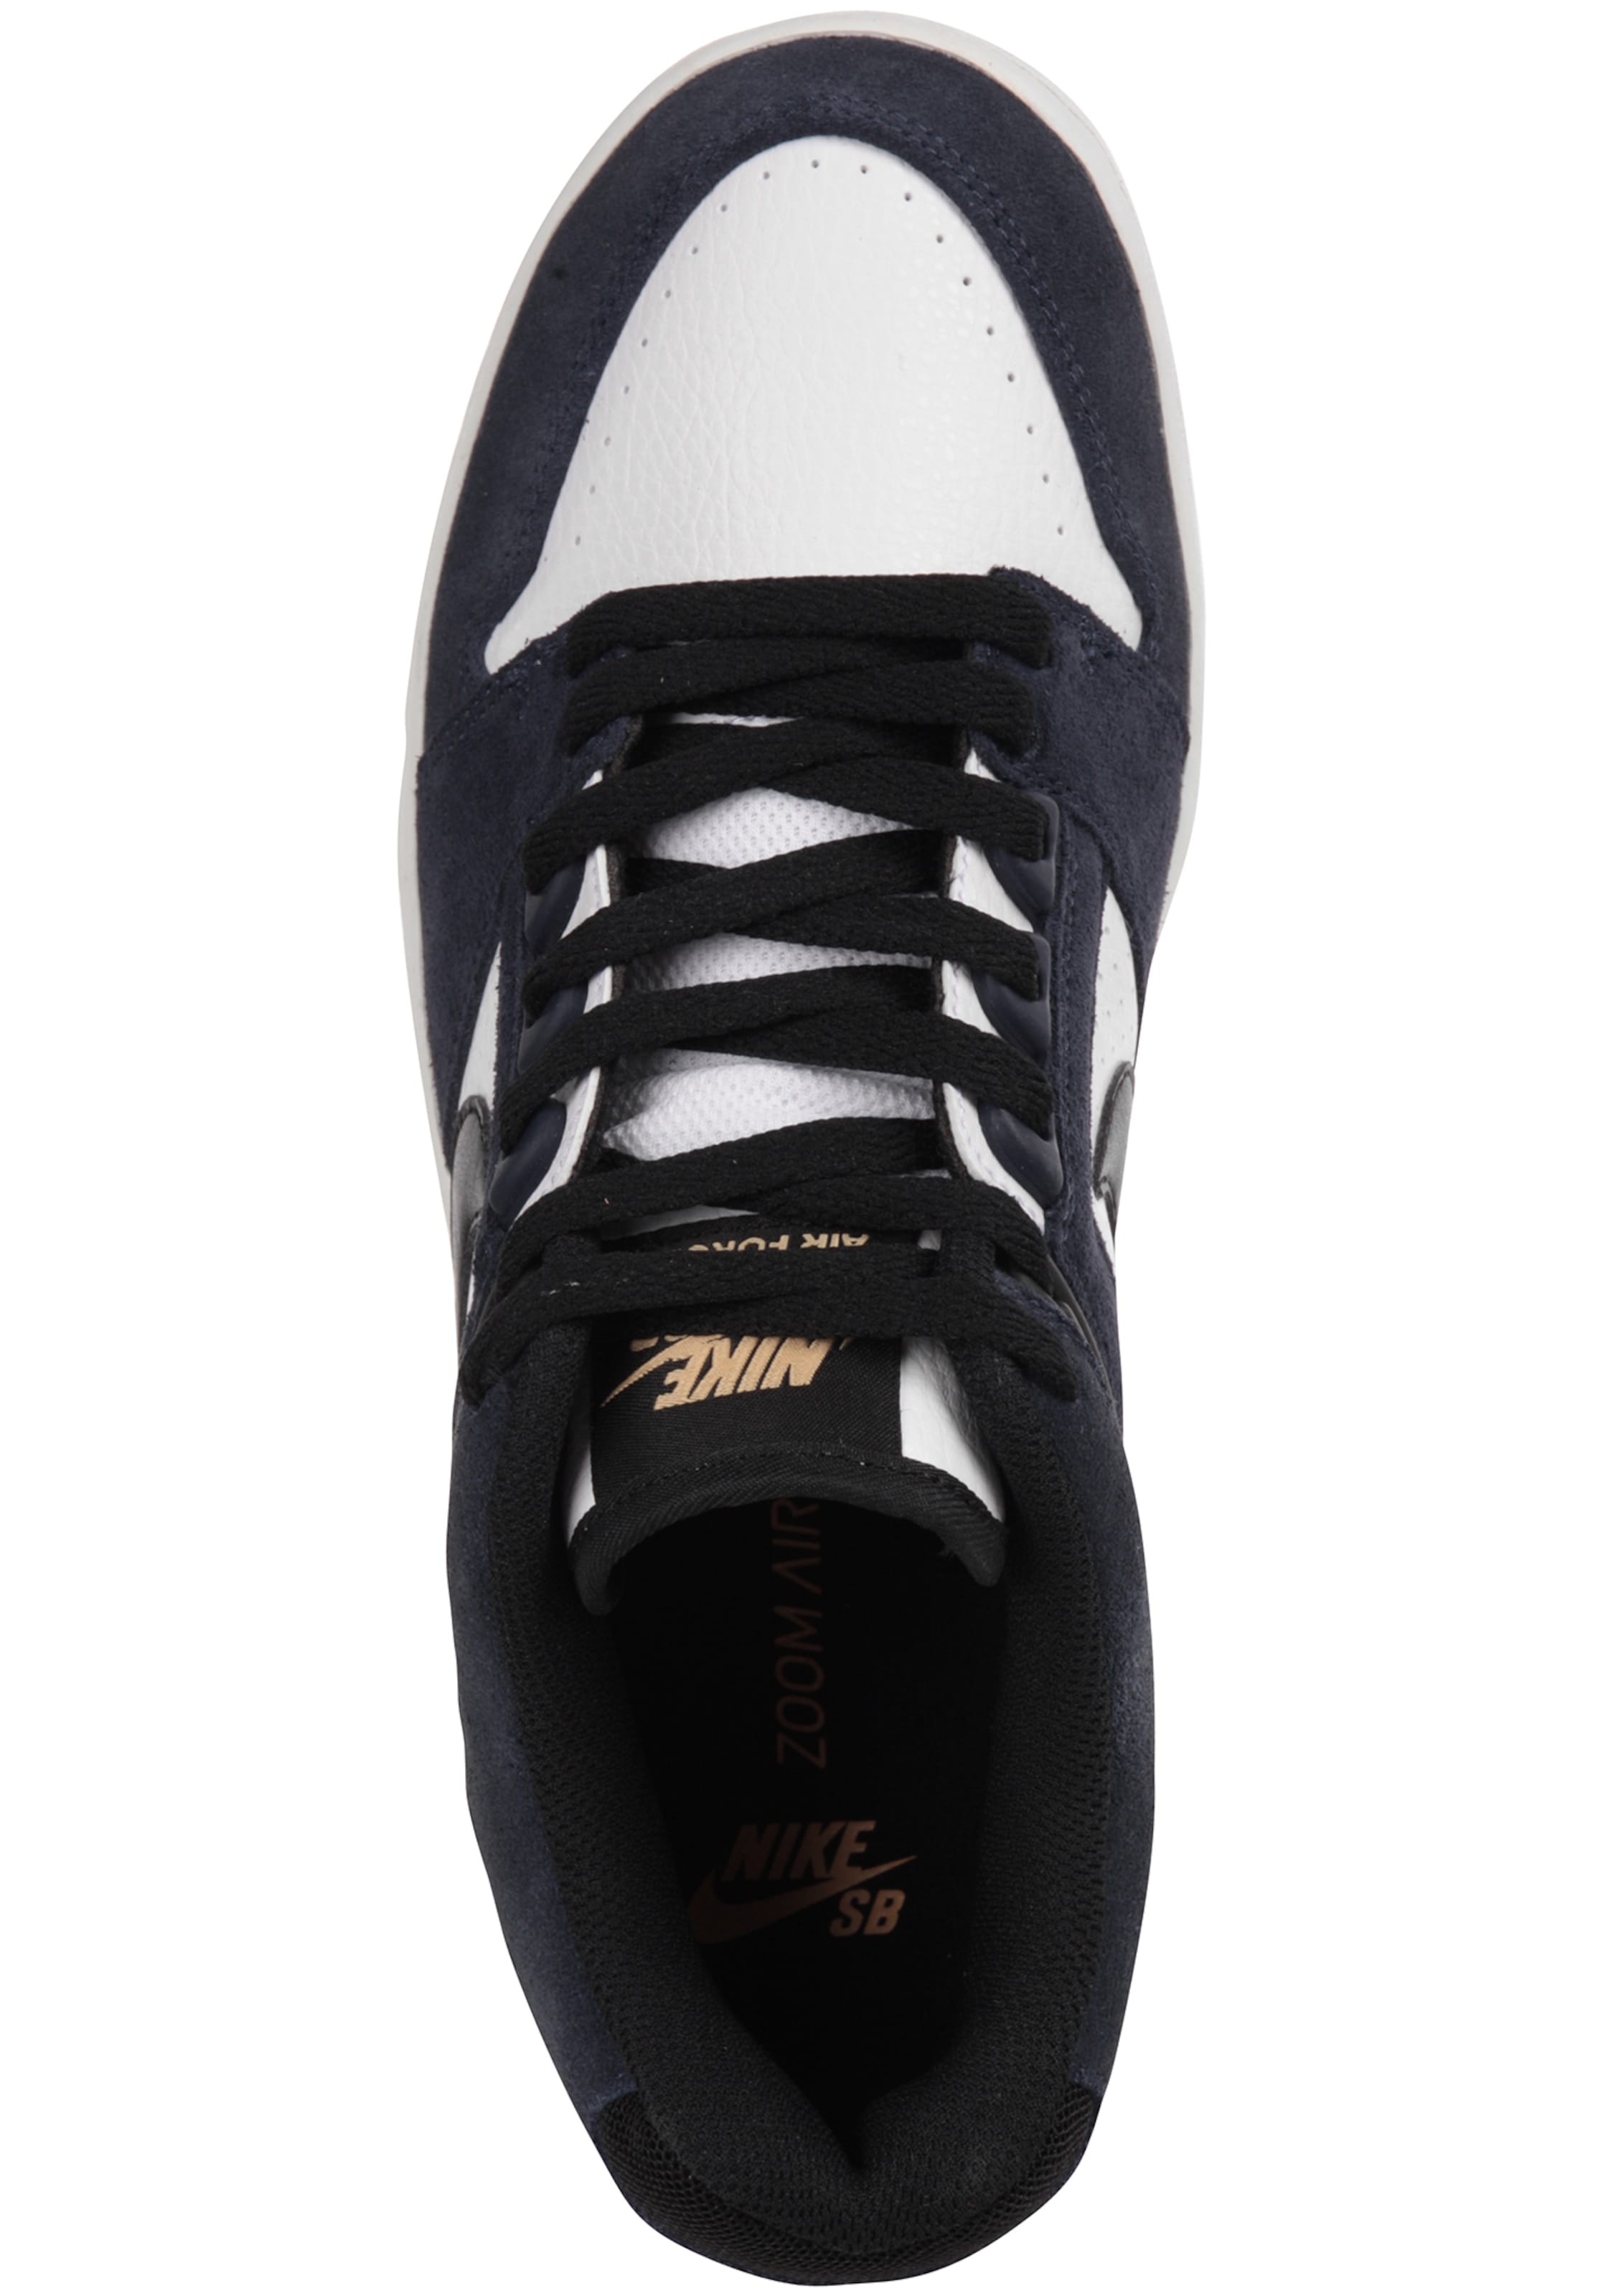 'air Sneaker Force Nike In NavySchwarz Weiß Sb Ii' A5Rj34L